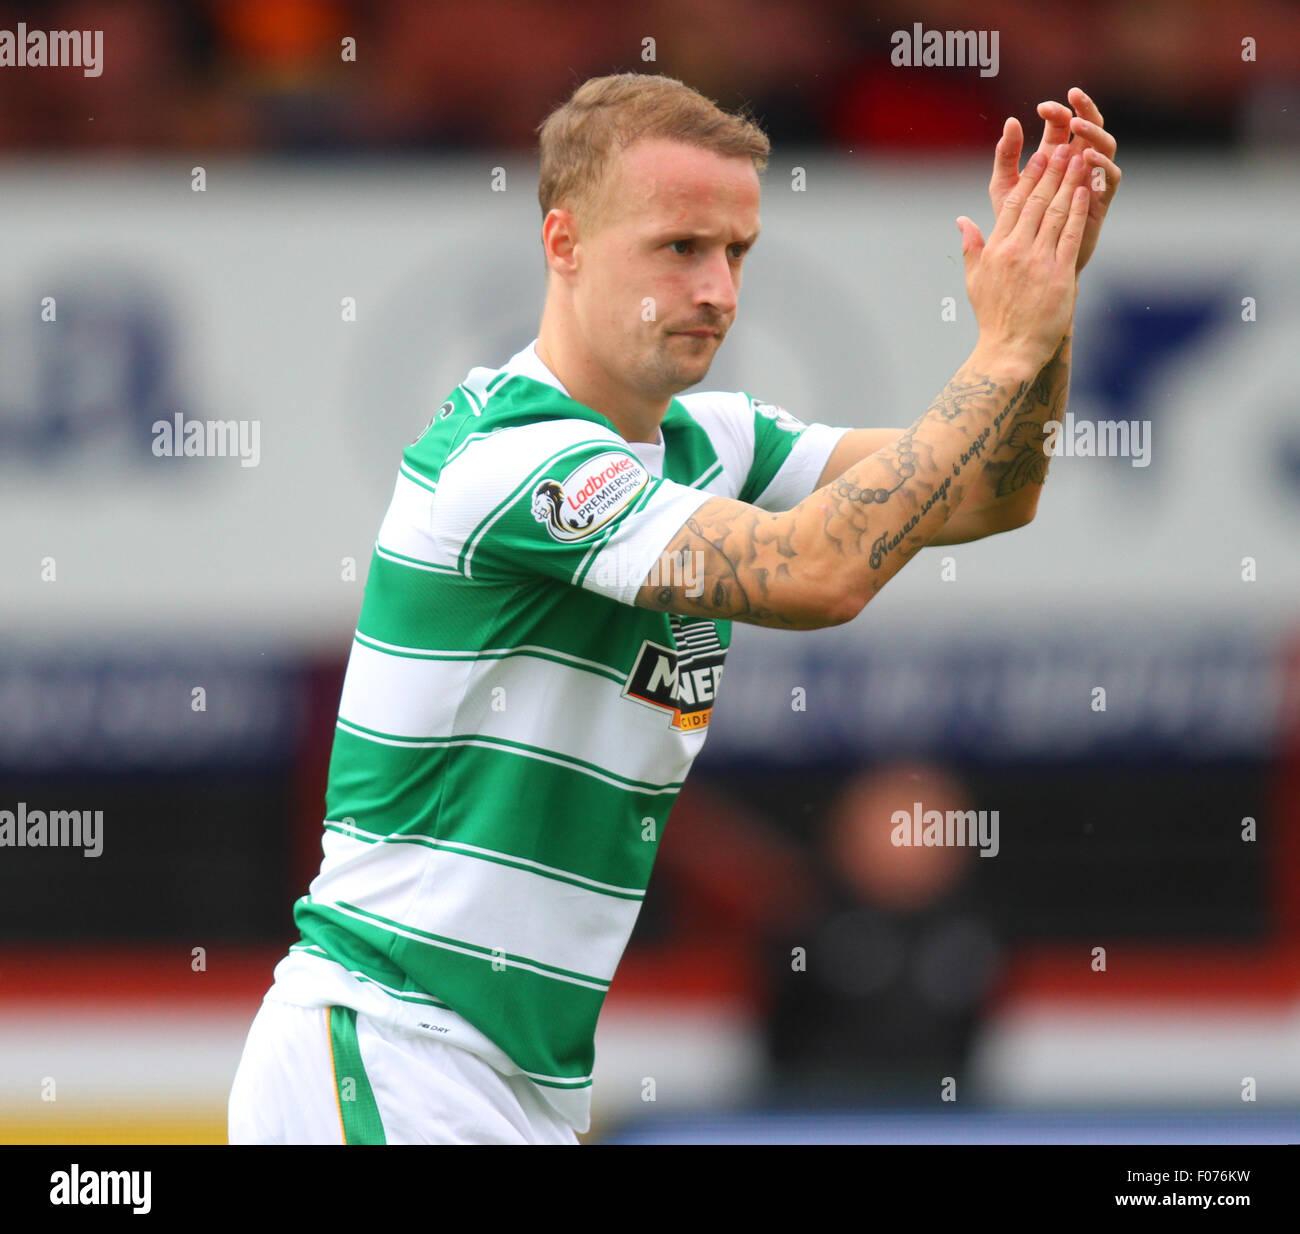 Glasgow, Scotland. 09th Aug, 2015. Ladbrokes Scottish Premiership. Partick Thistle versus Celtic. Leigh Griffiths - Stock Image